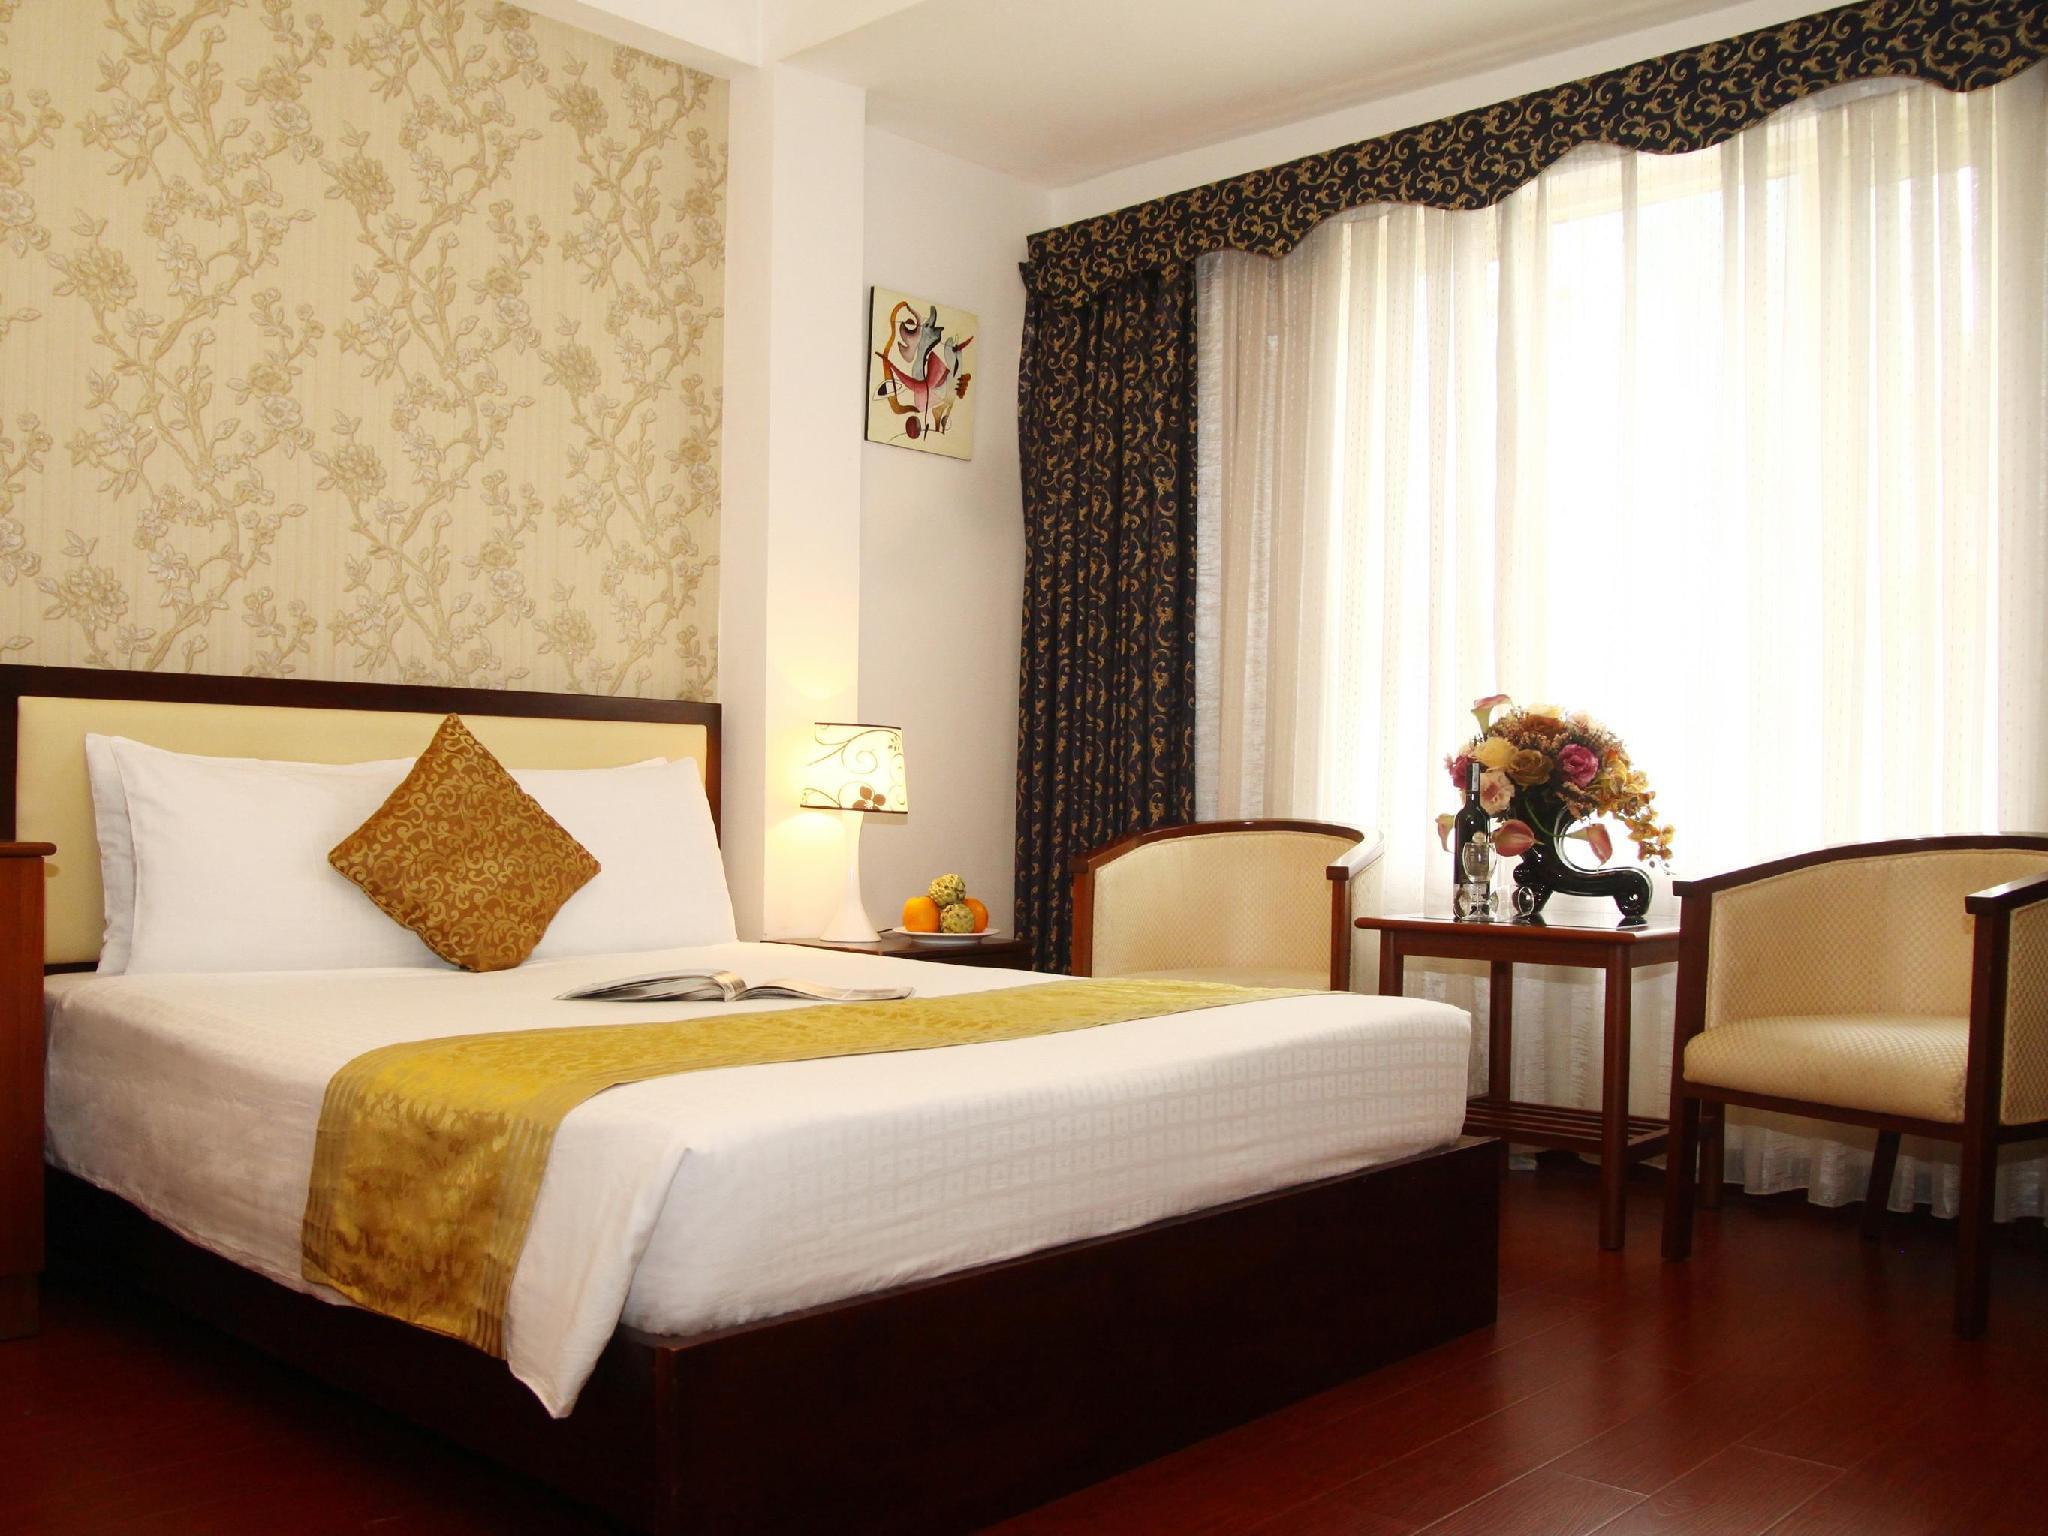 M&M Hotel - Bui Thi Xuan Street